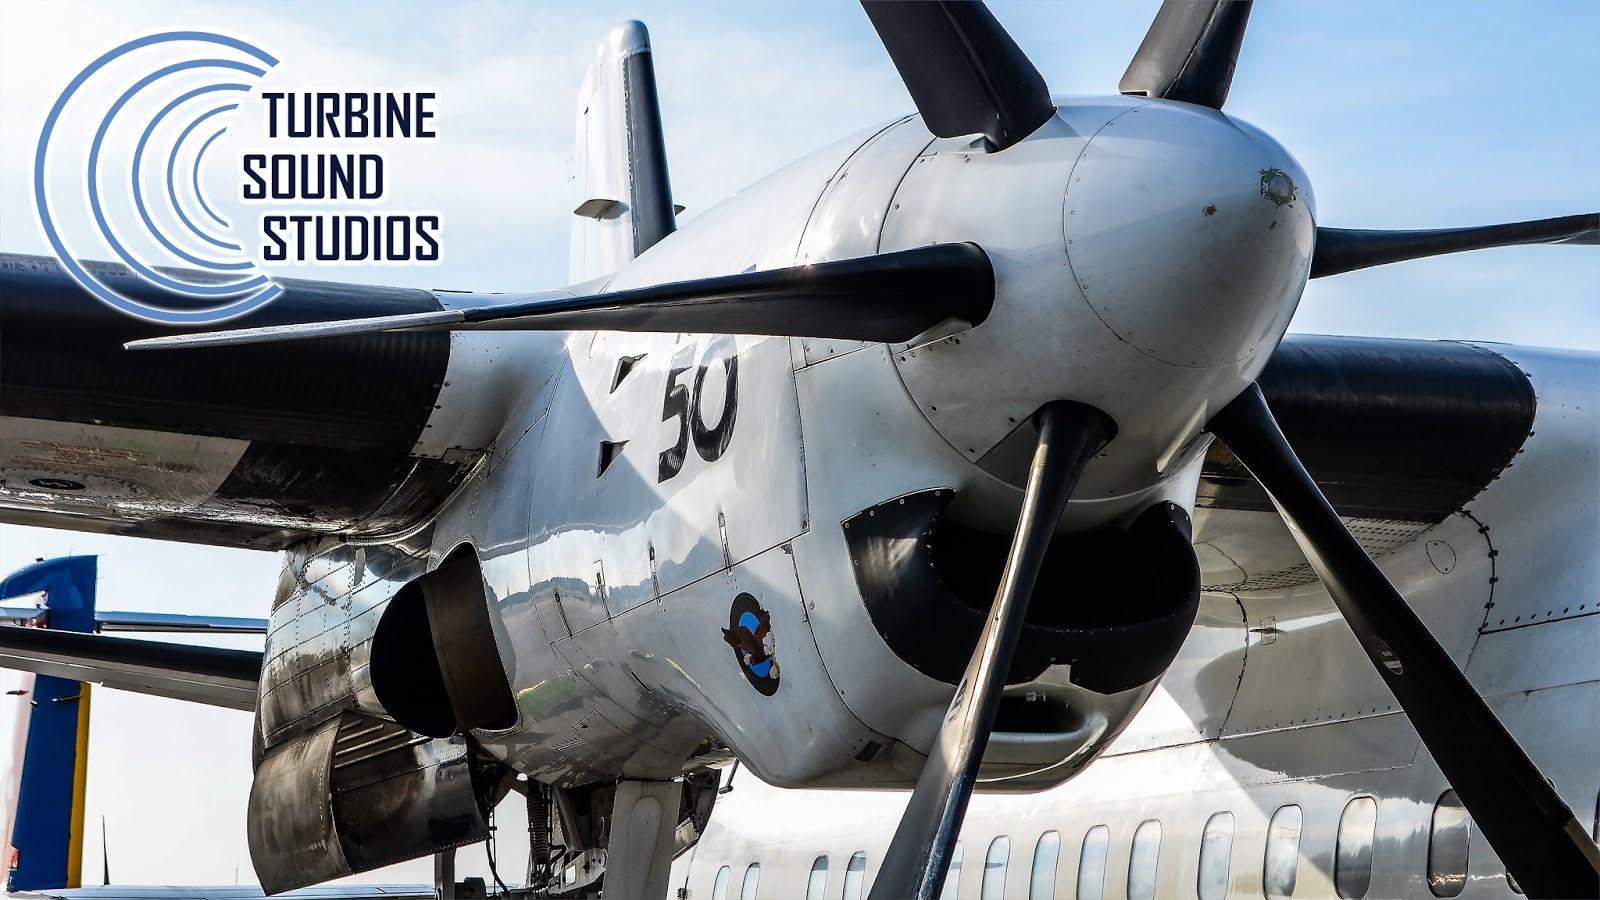 FSX/FSX:SE/P3Dv2/P3Dv3/P3Dv4] Carenado - Fokker F50 v1 1 /Turbine